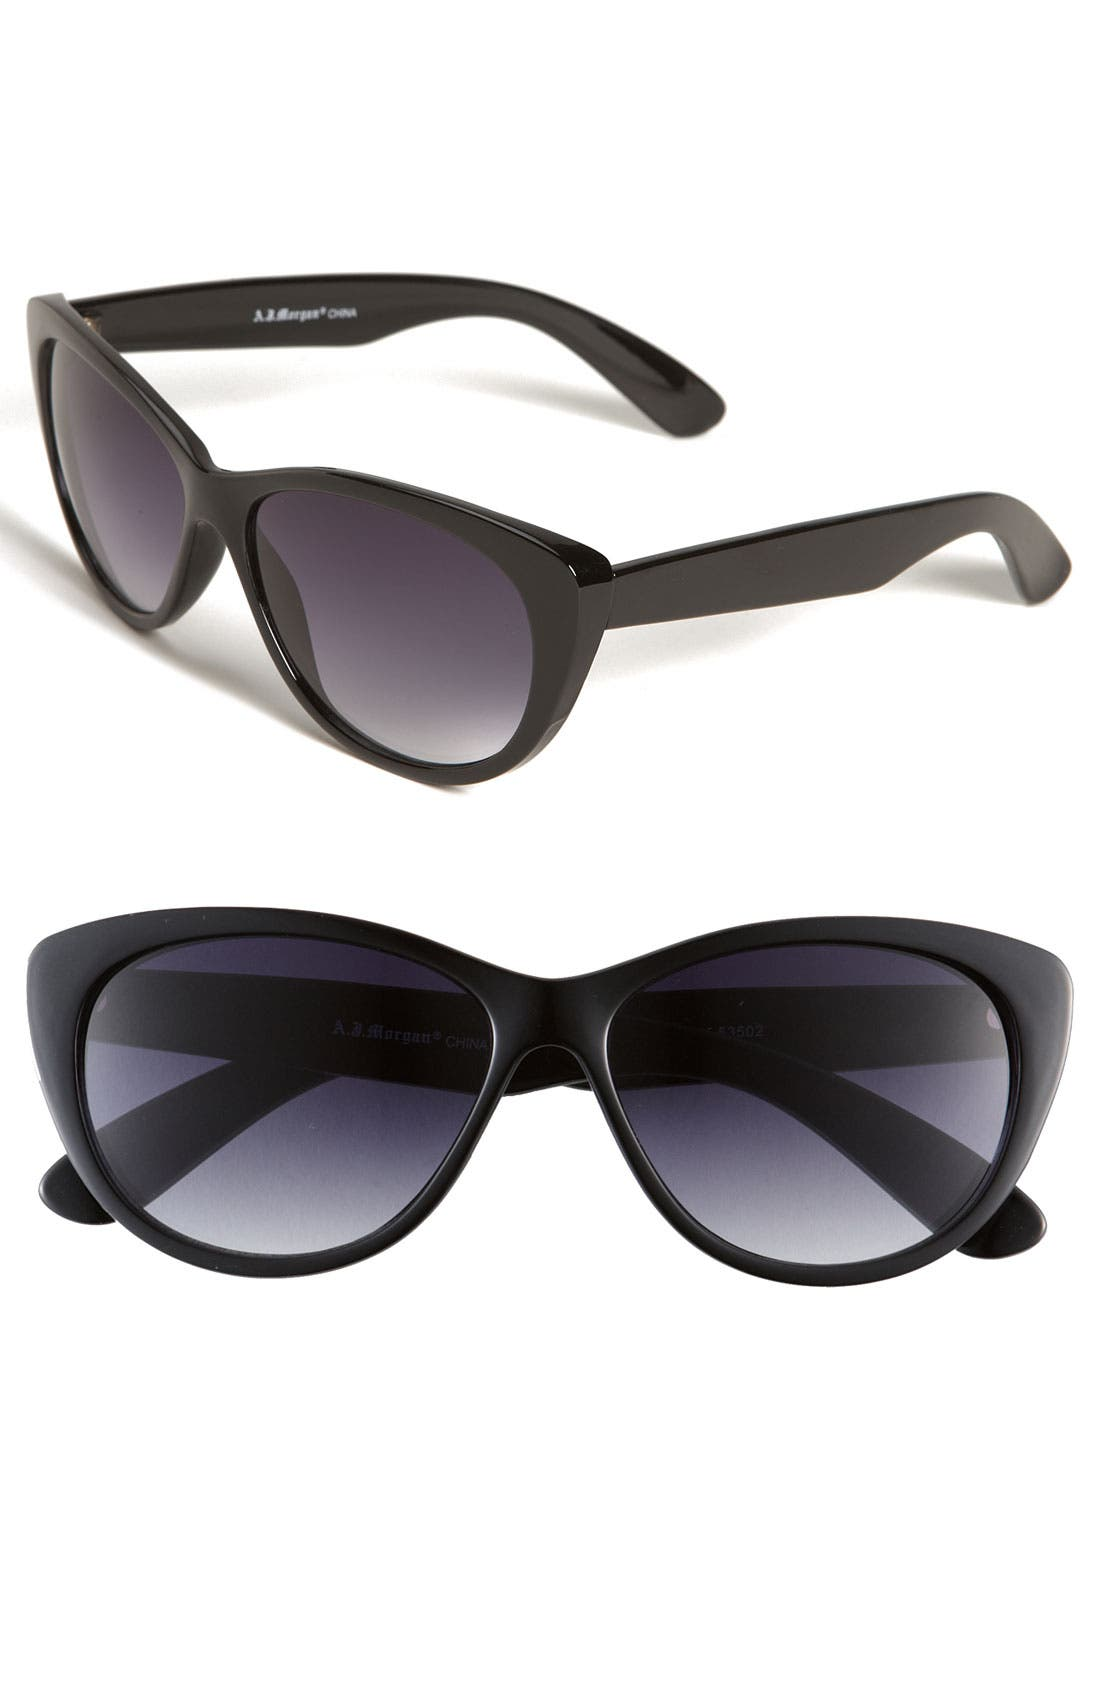 Alternate Image 1 Selected - A.J. Morgan 'Lana' 57mm Sunglasses